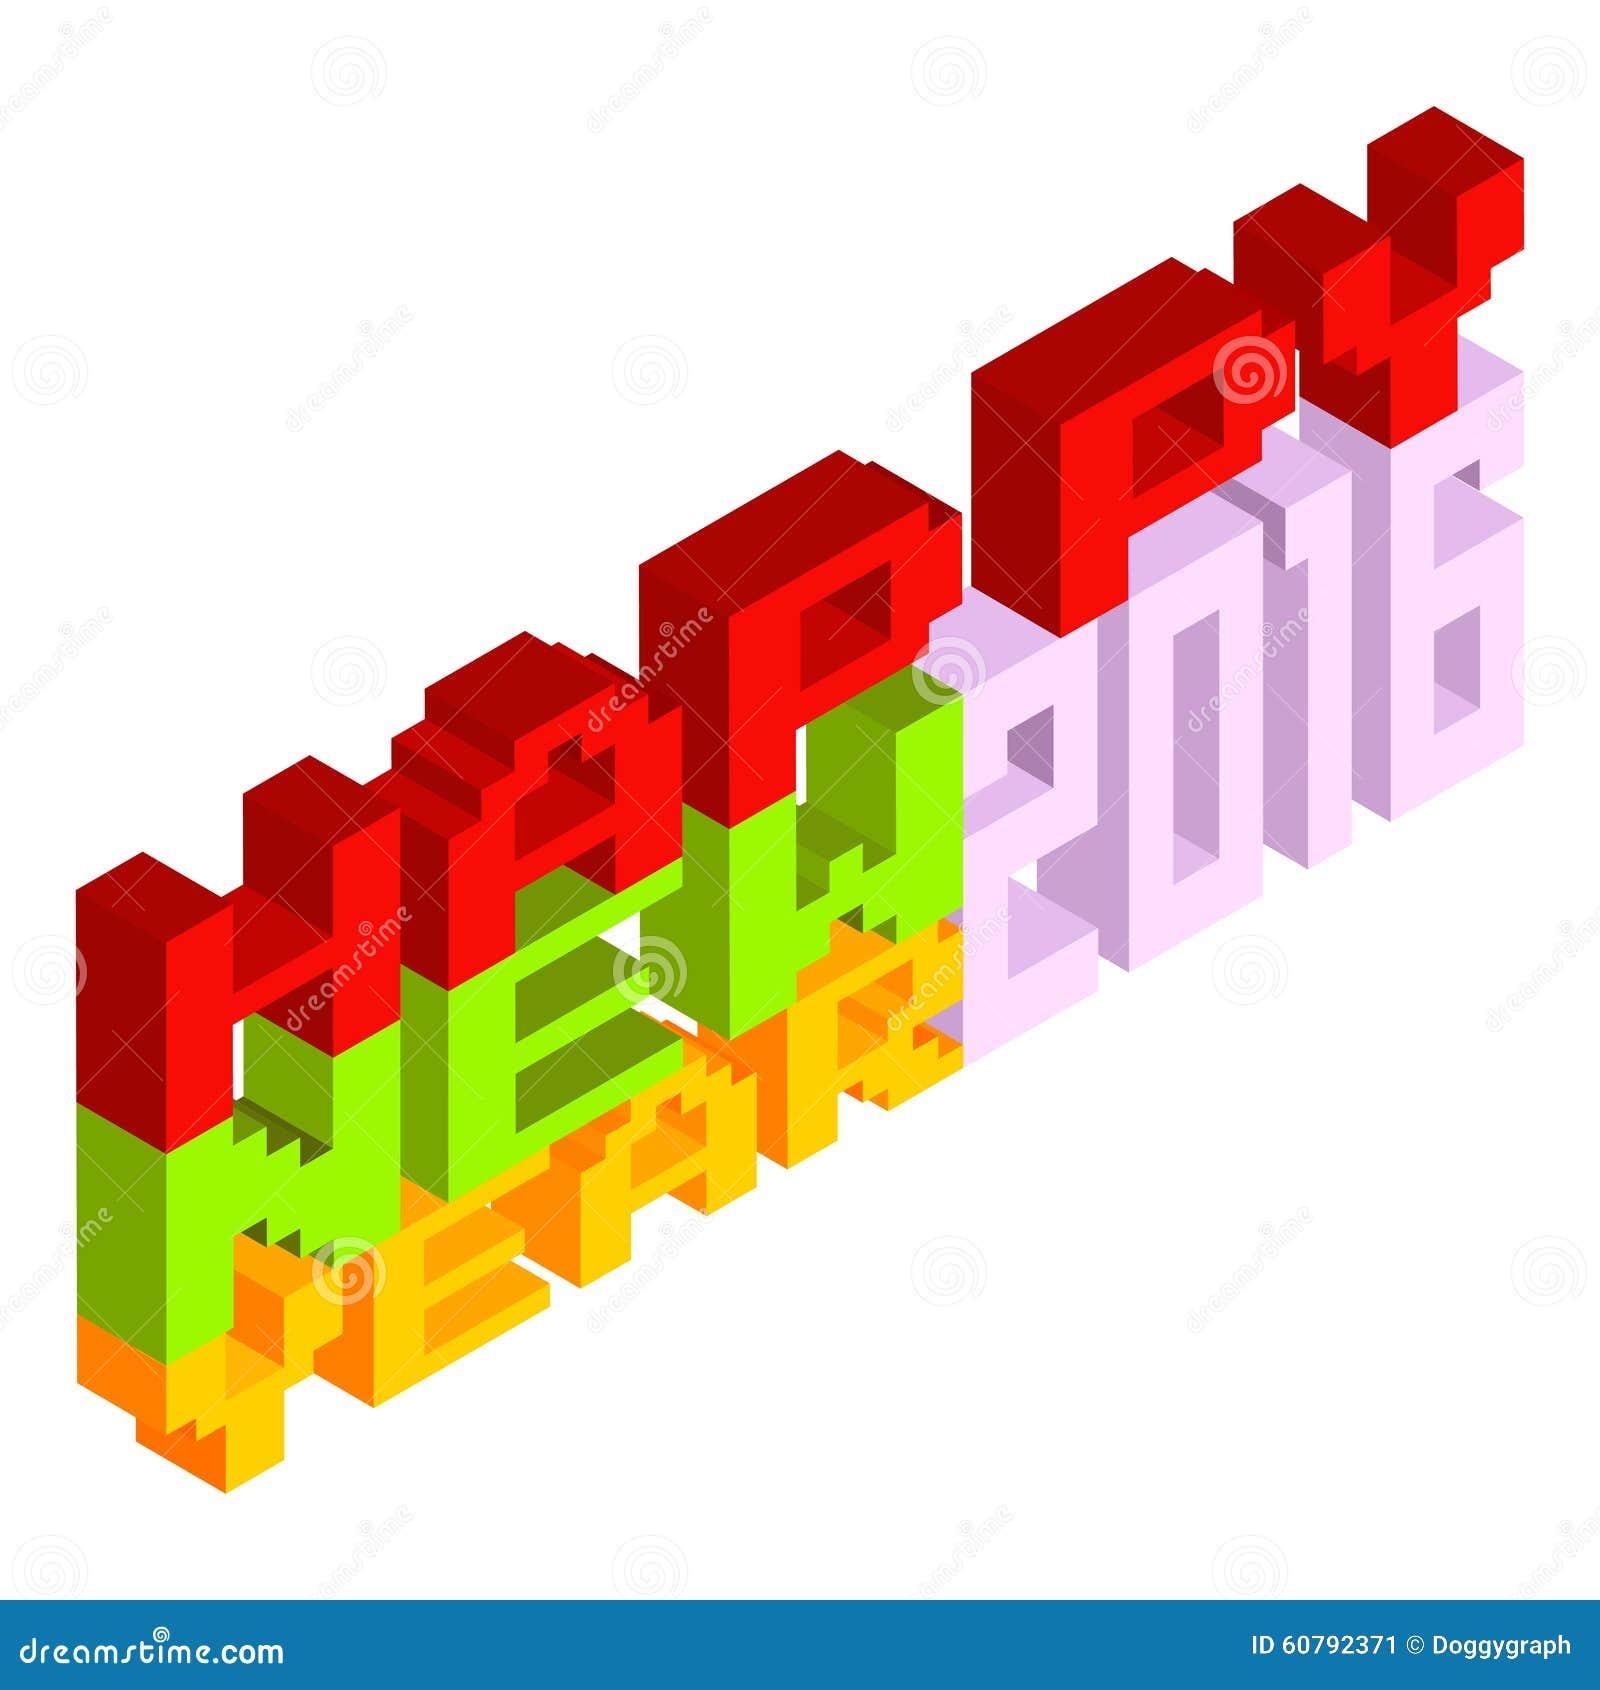 happy new year 2016 pixel art 8 bit style